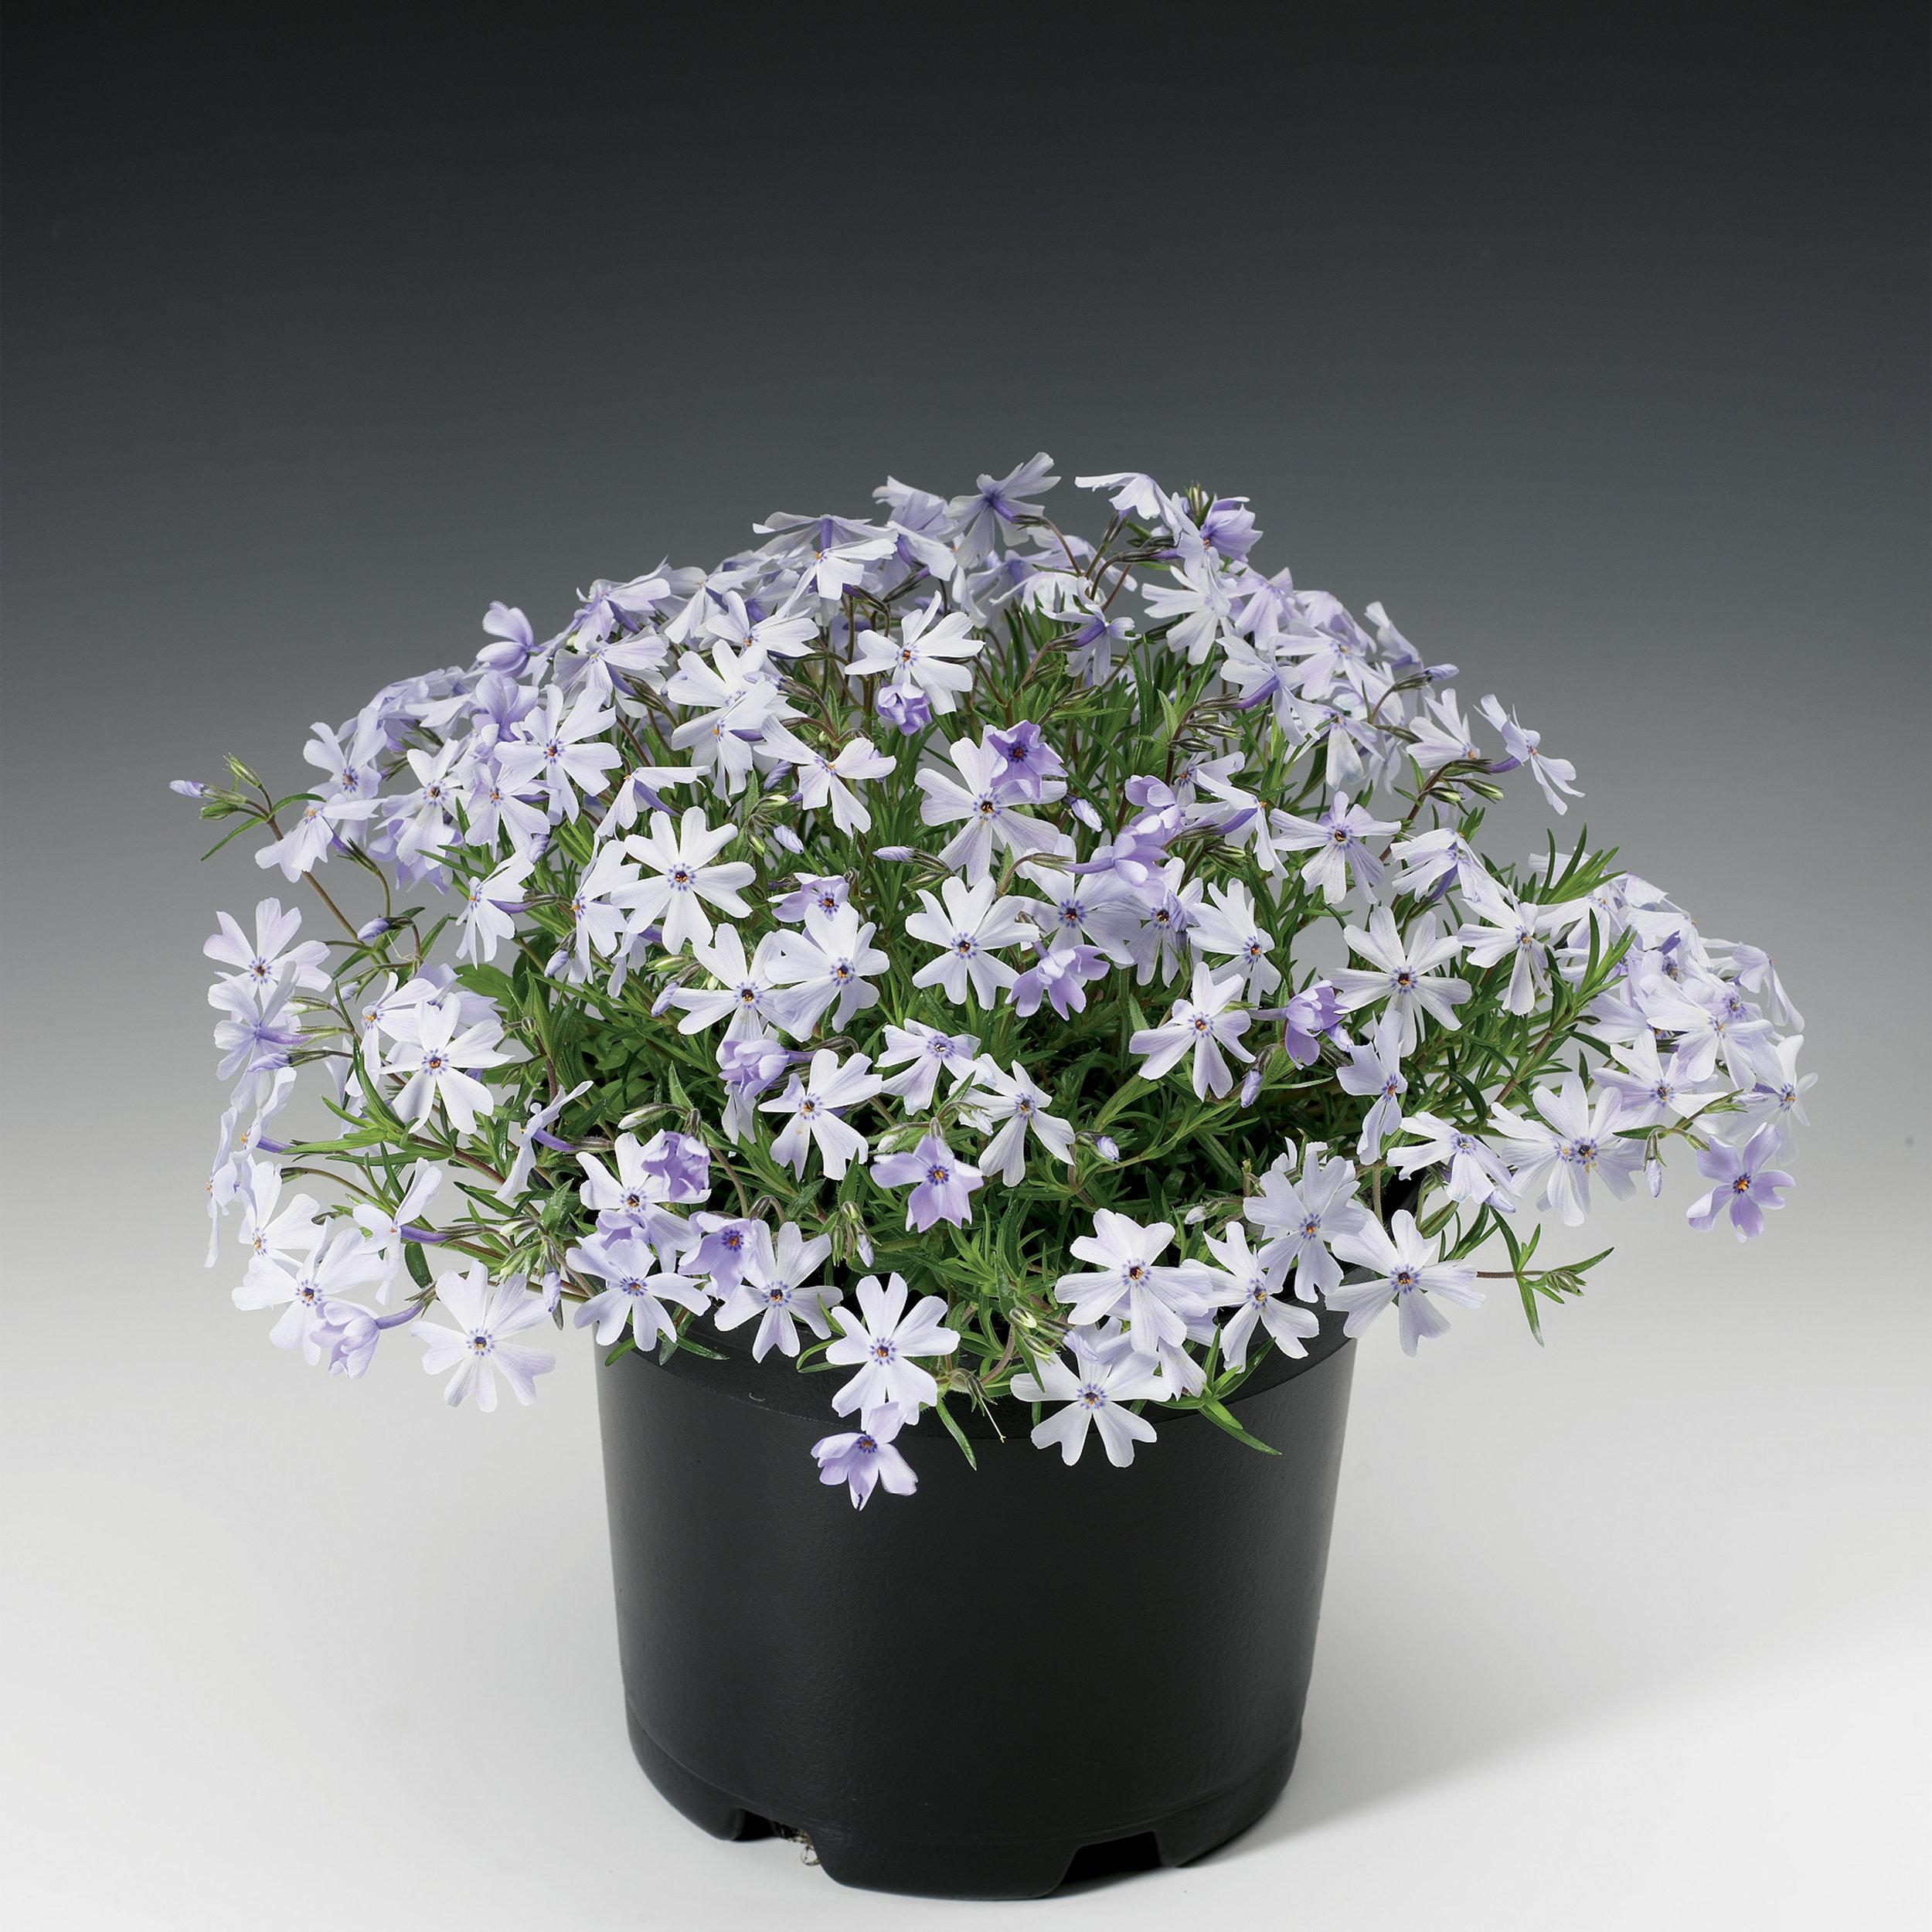 HR_Vegetative_Phlox_Emerald_Cushion_Emerald_Cushion_Blue_70004206_1.jpg